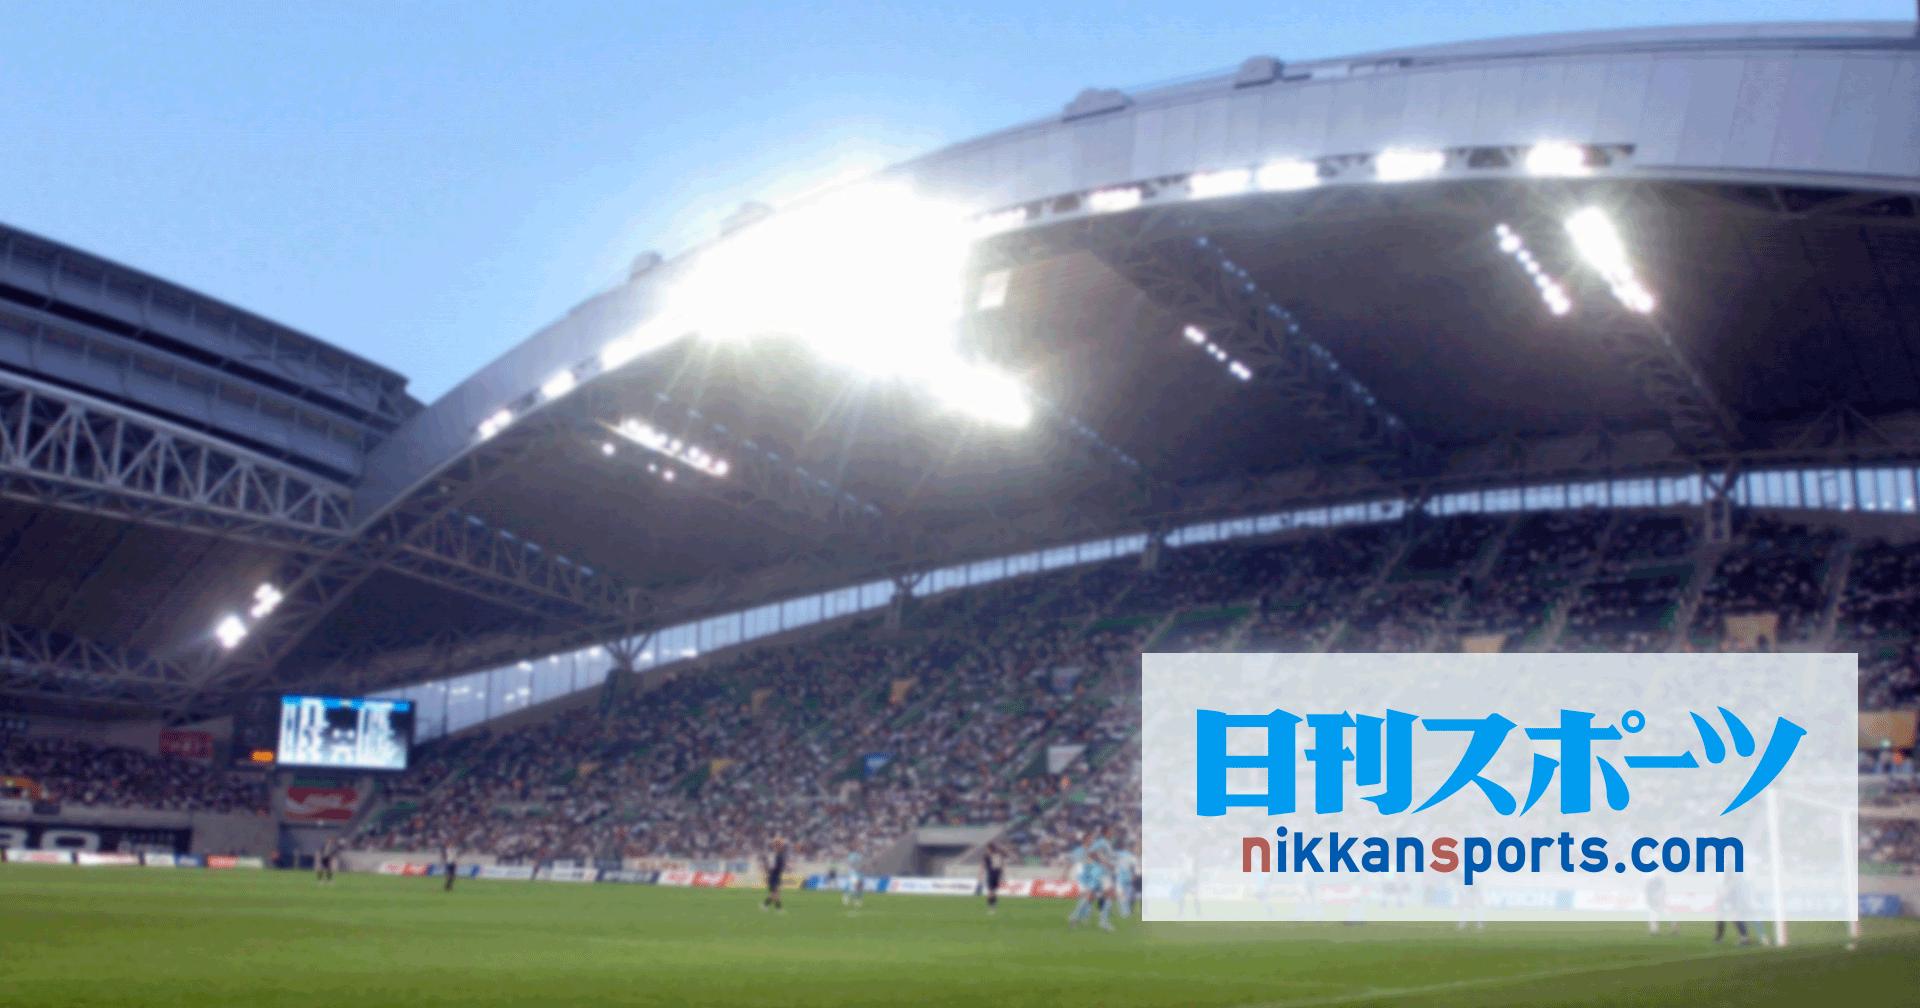 NHK「最後の最後まで」SMAP紅白無期限で待つ - ジャニーズ : 日刊スポーツ